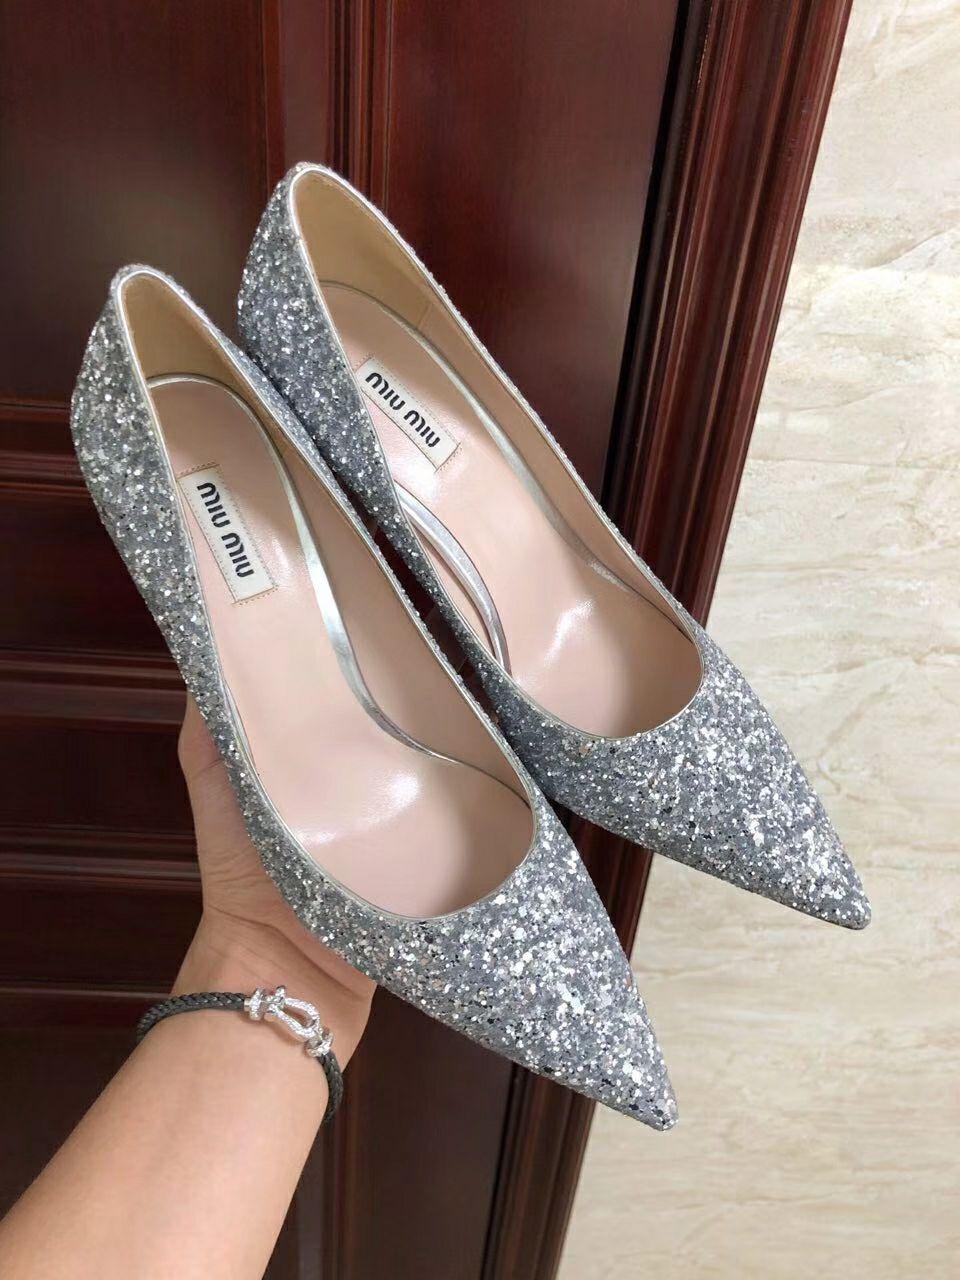 MIU MIU GLITTER FABRIC PUMPS 85 mm heel with crystals SI  ER  7